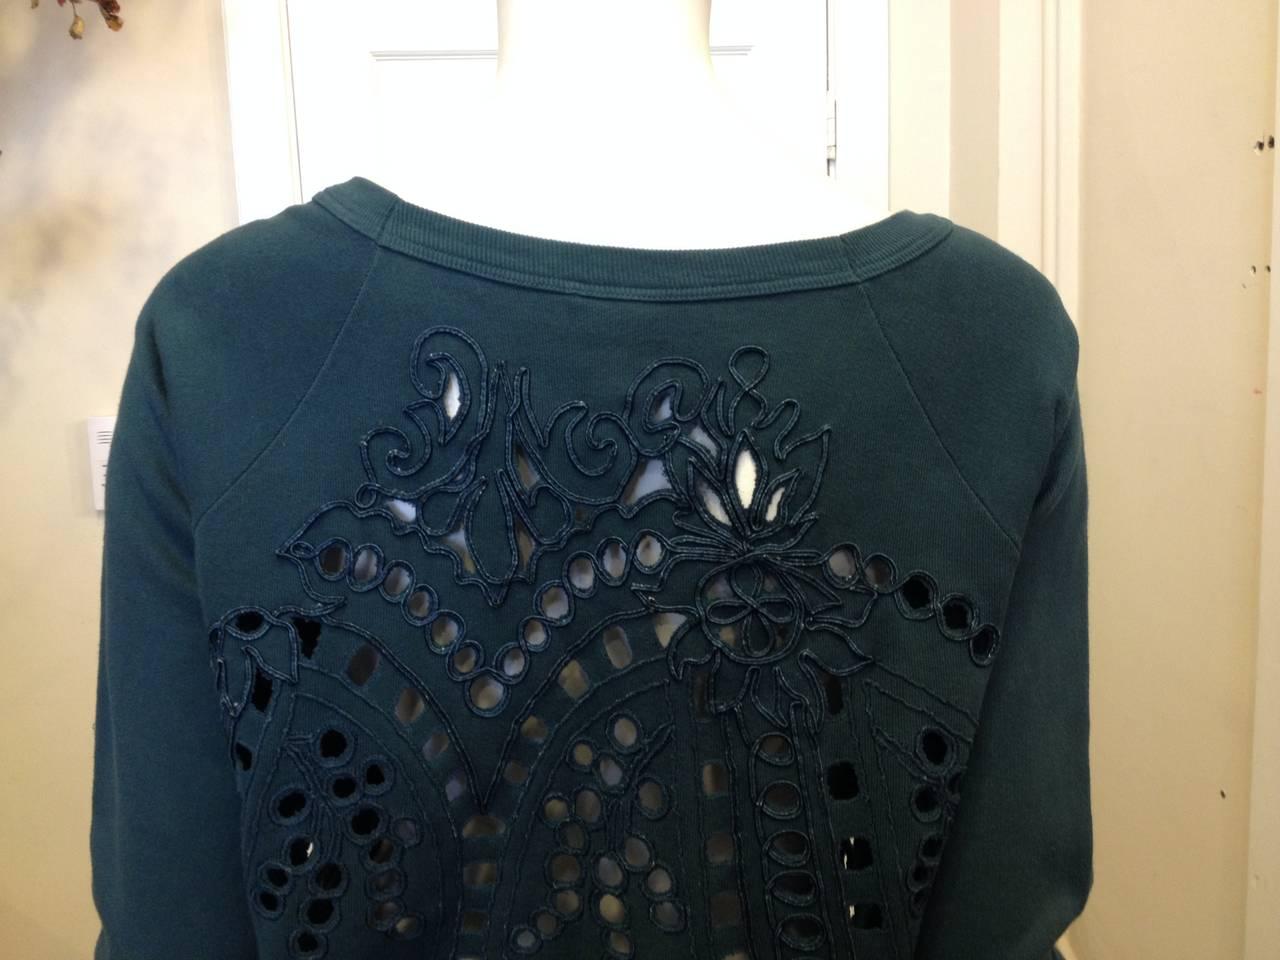 Dries Van Noten Teal Green Cutout Embroidered Sweatshirt 6